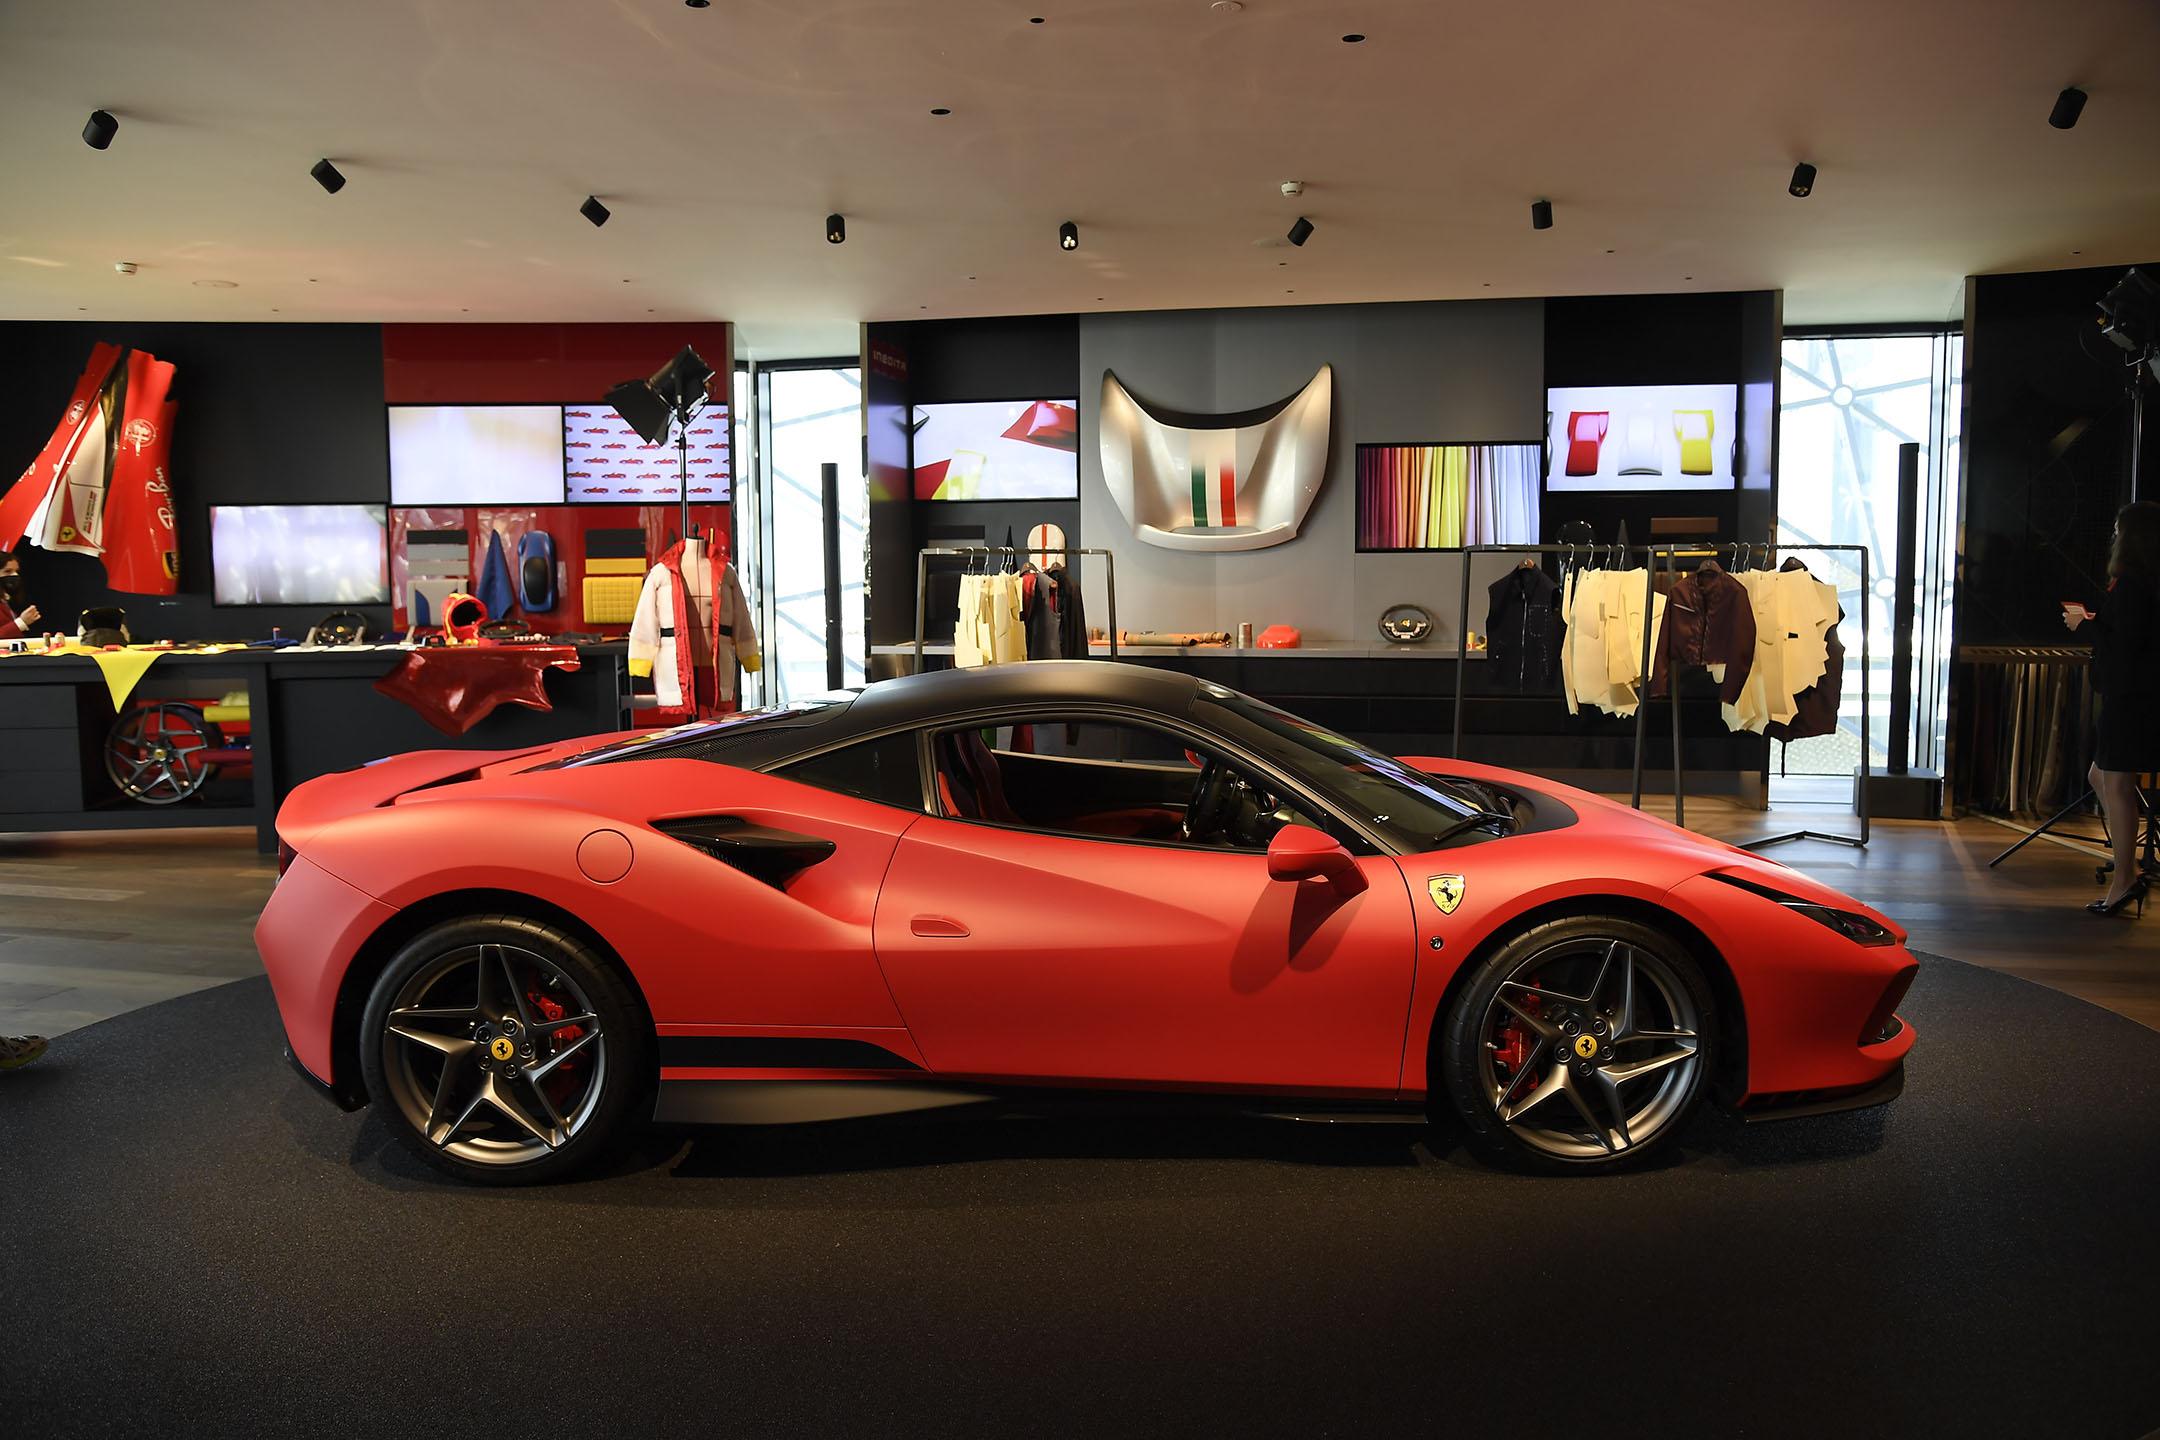 Ferrari fashion show - behind the scenes - automobili - 2021 - photo by Giovanni Giannoni via WWD